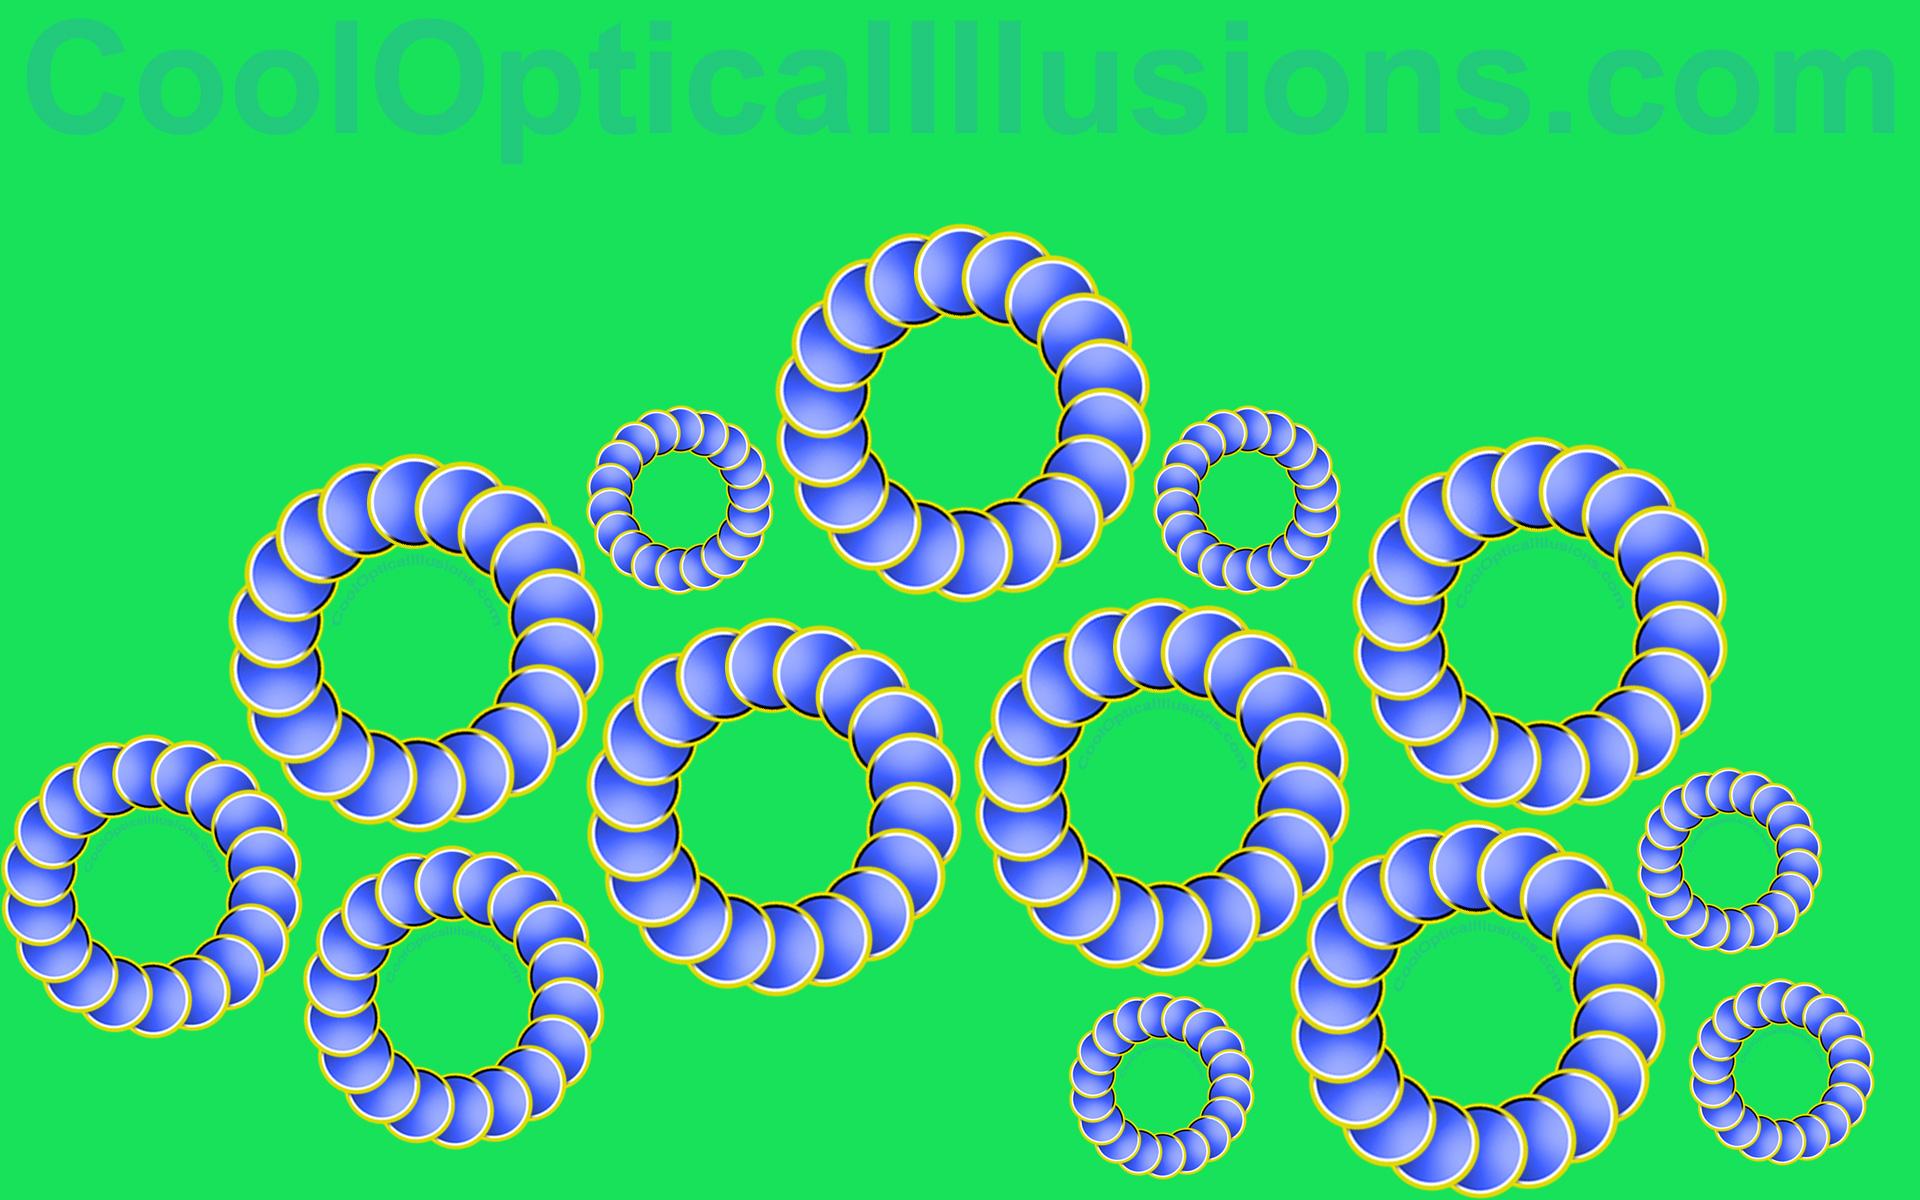 Cool Moving Backgrounds for Desktop – Free wallpaper download